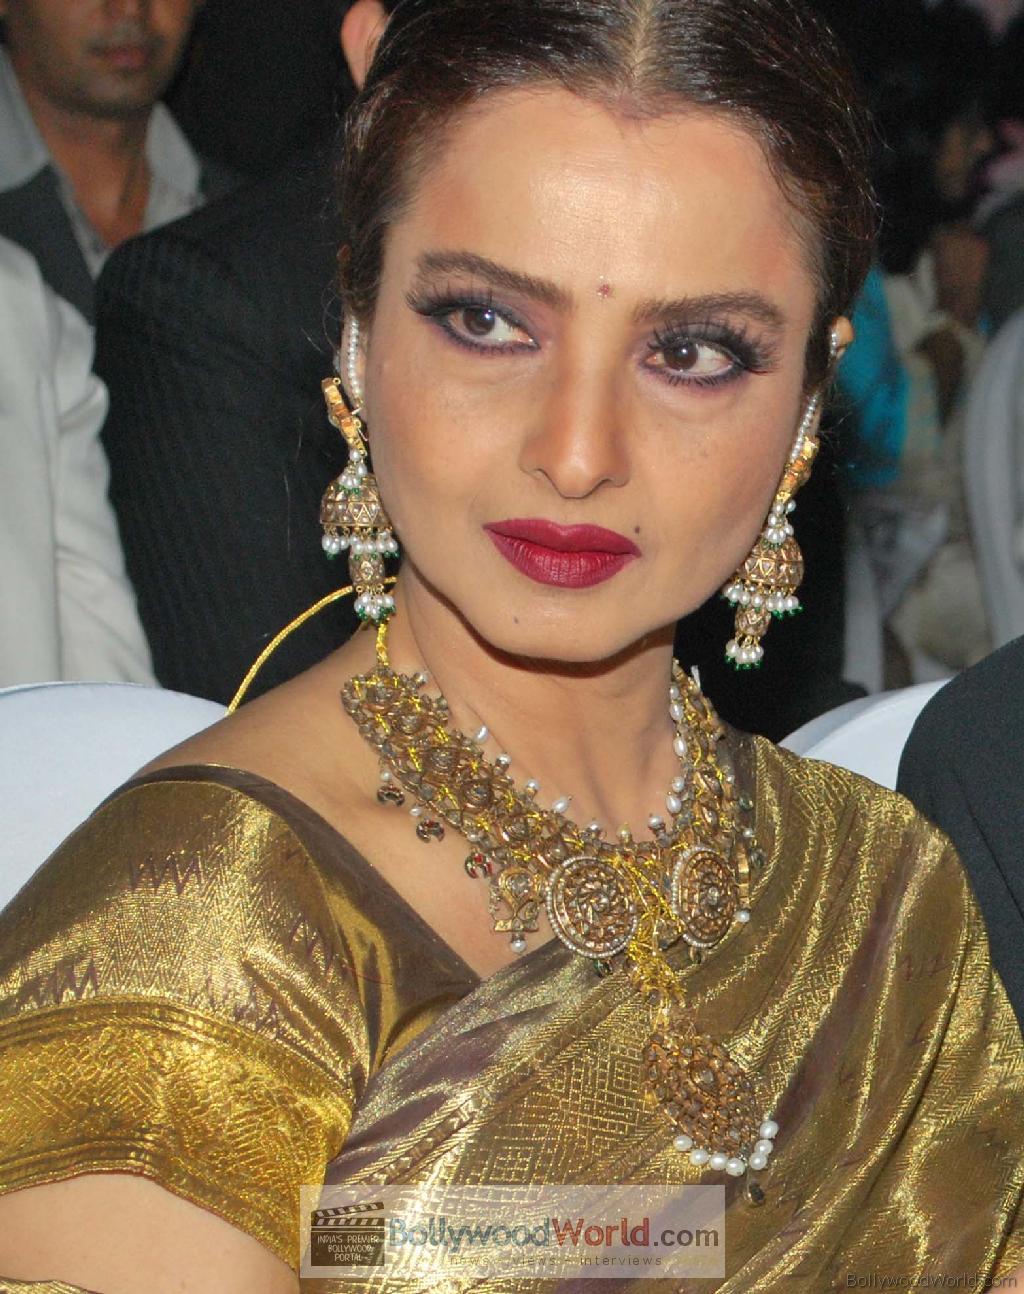 Bollywood Ka Garma Garam Khabar: Hello Madam Re!